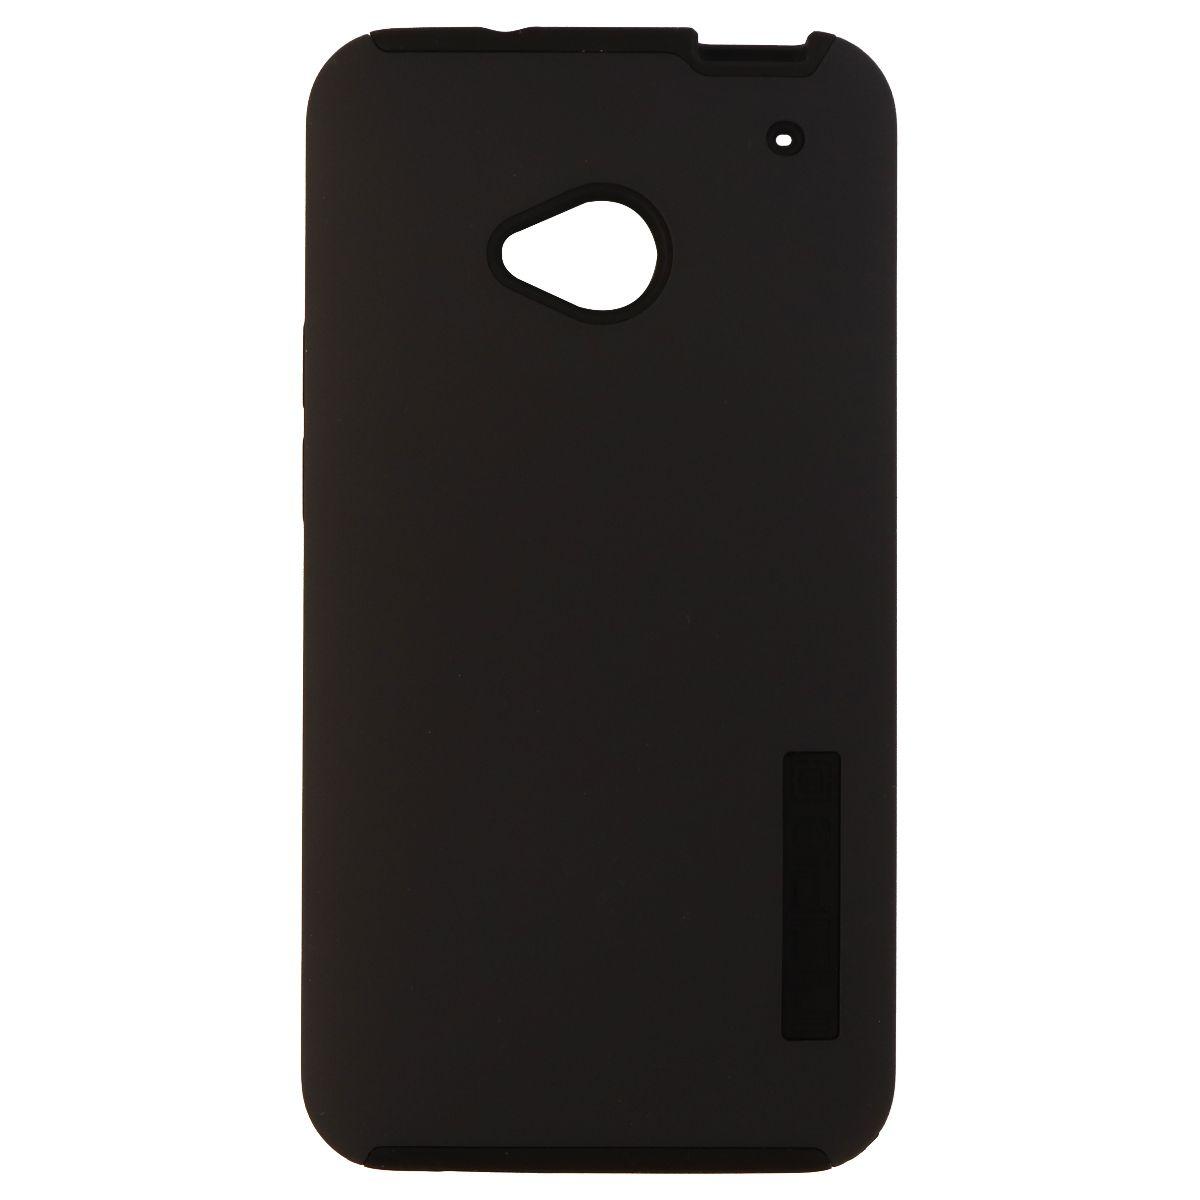 Incipio Dual Pro Series Protective Case Cover for HTC One M7 - Dark Gray